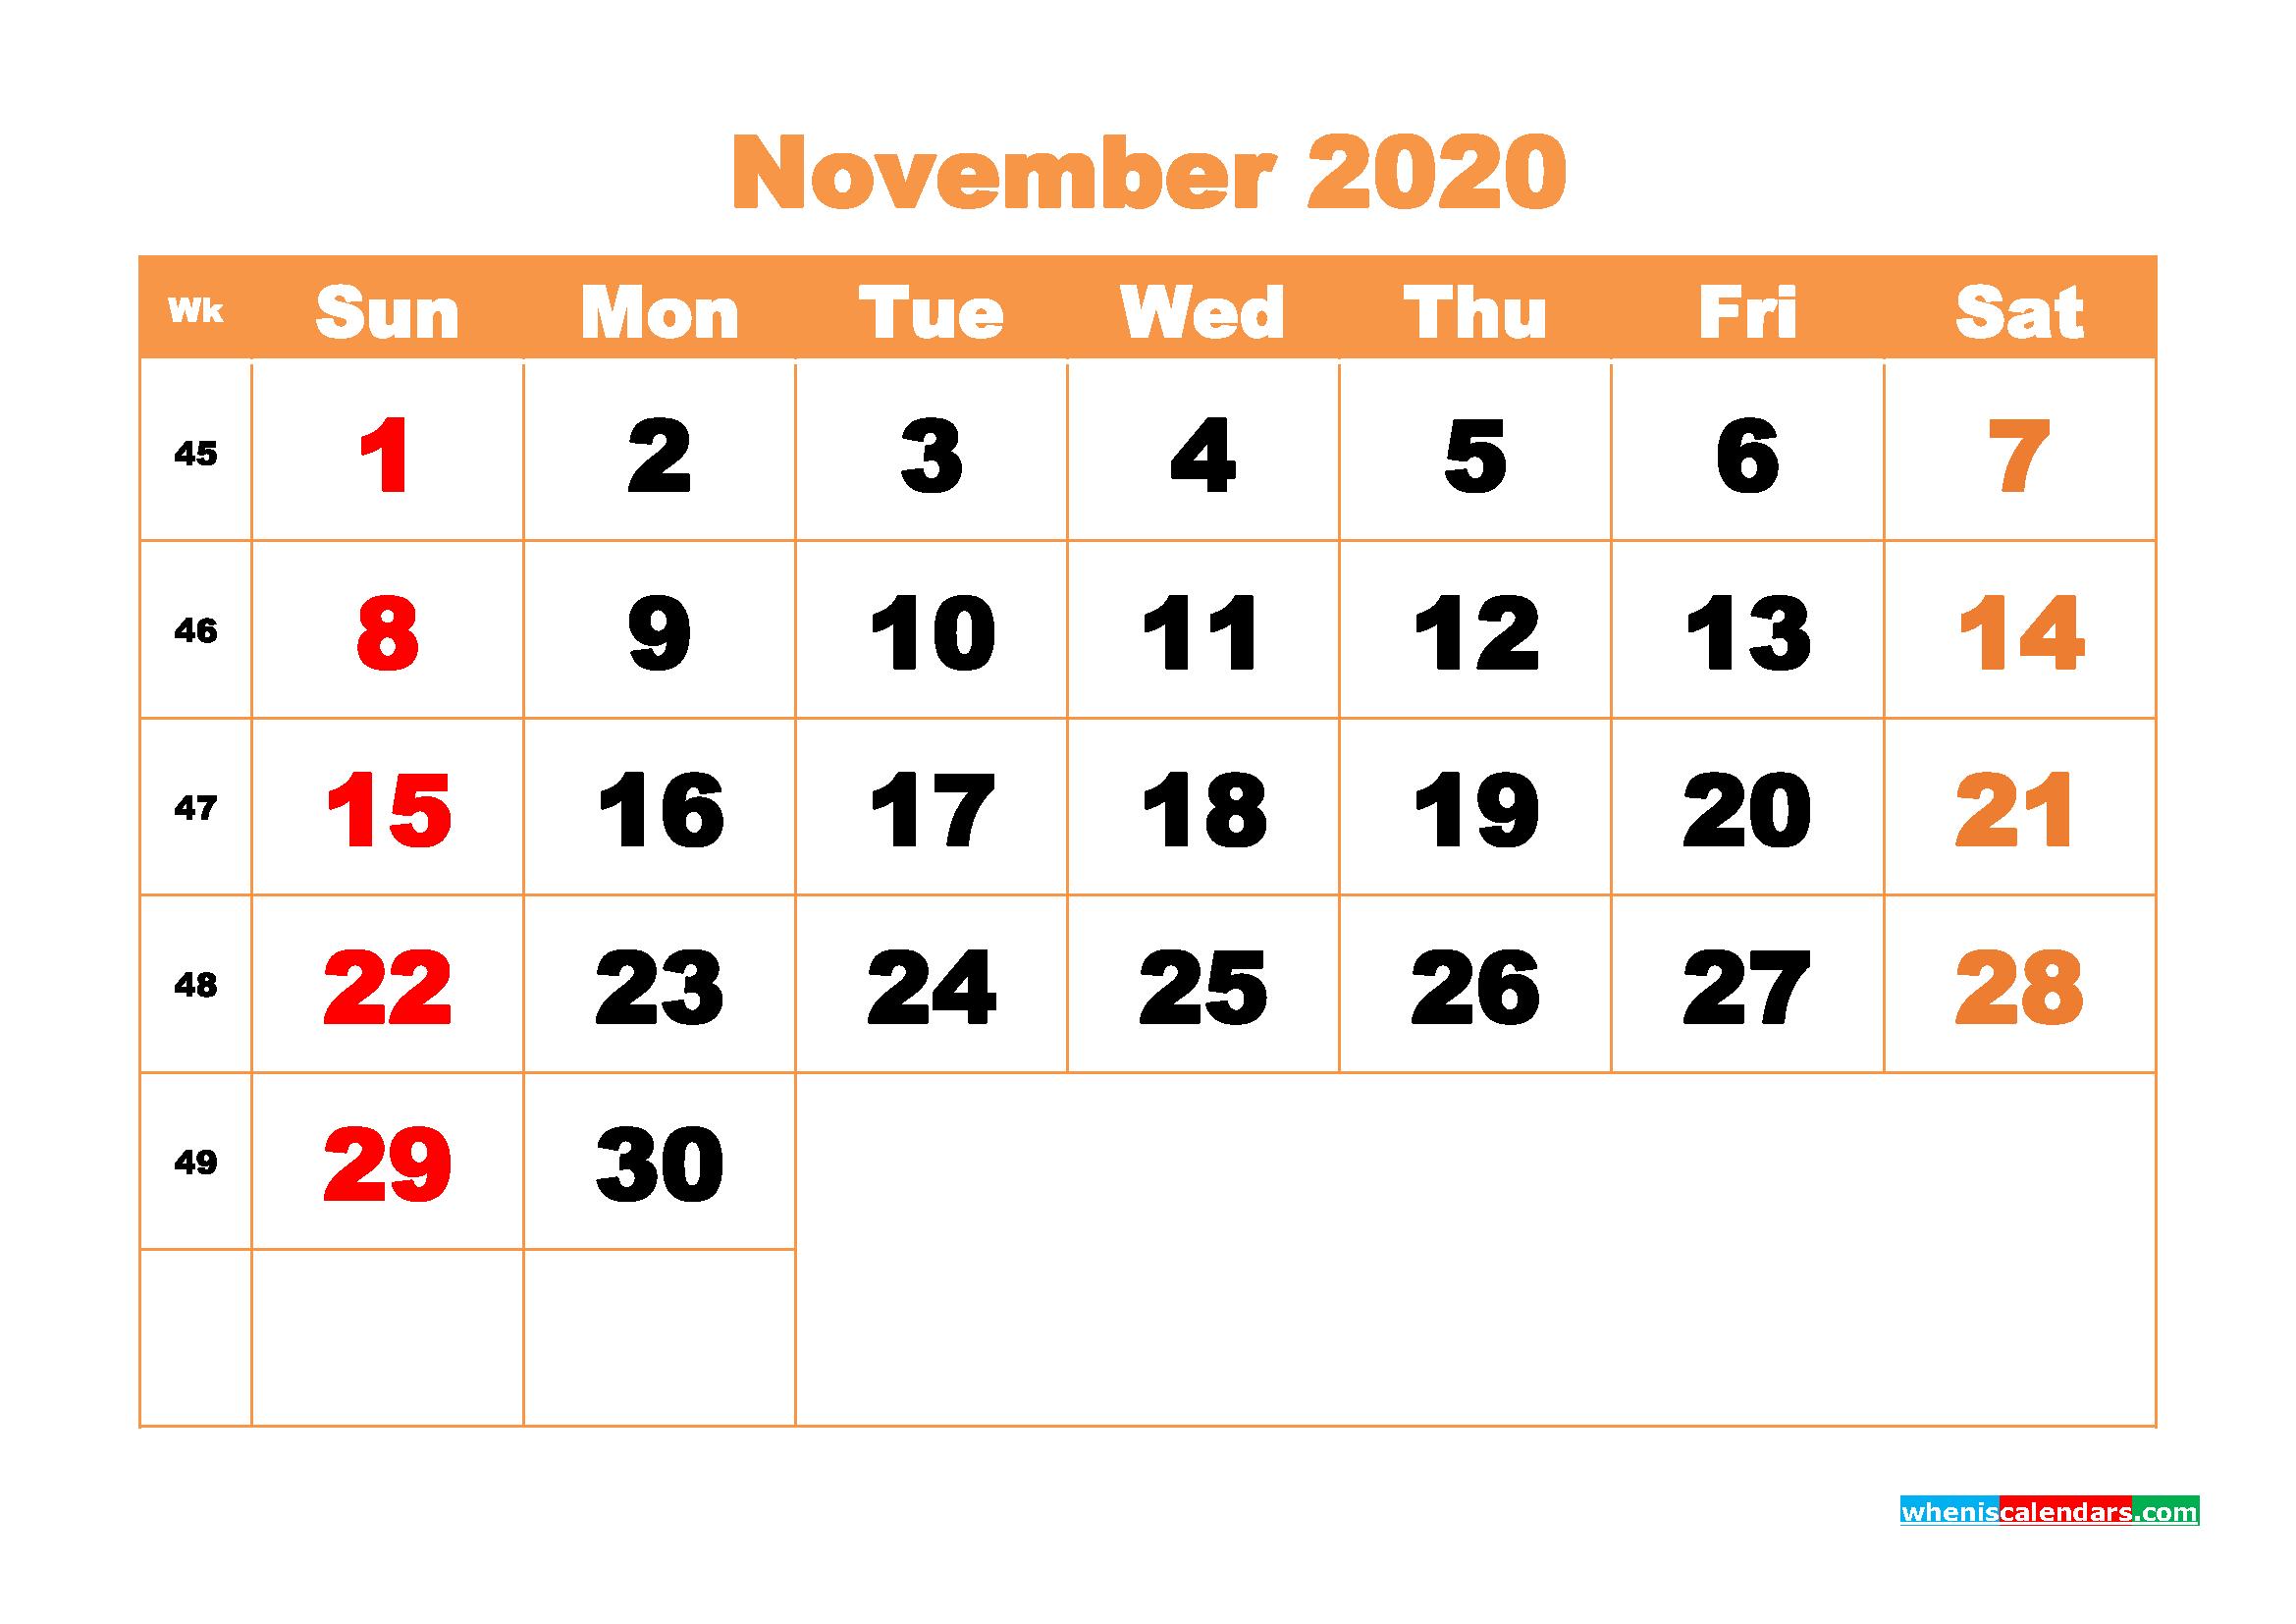 November 2020 Blank Calendar Printable - No.m20b431